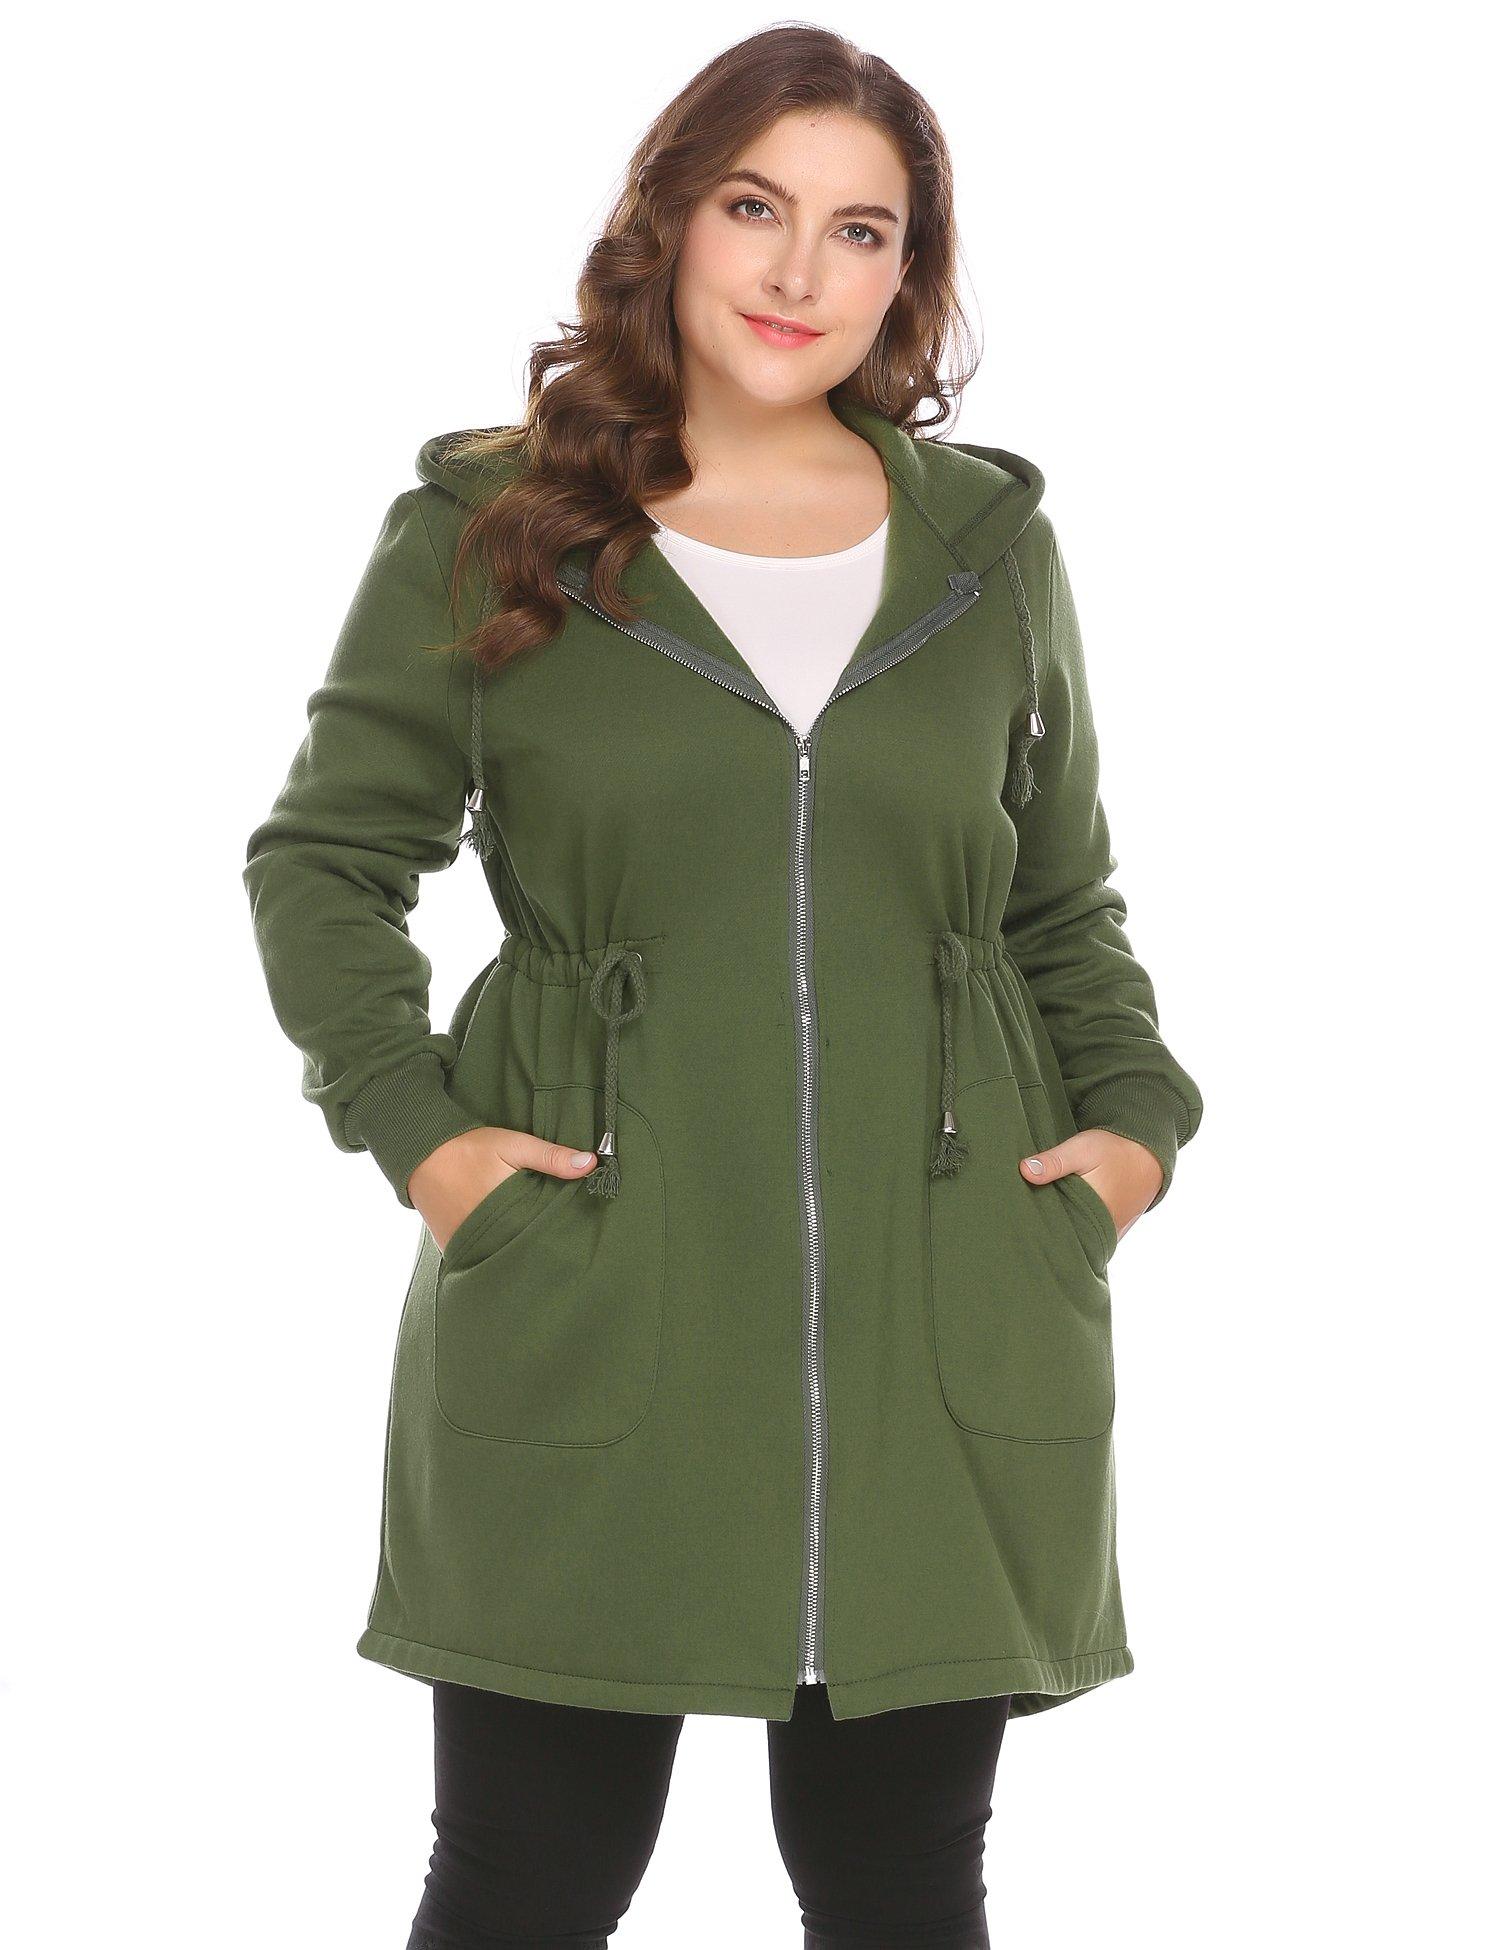 Zeagoo Women's Plus Size Casual Zip up Fleece Hoodies Long Tunic Hooded Sweatshirt Jacket Coat Outerwear With Pockets, Olive Green, 18